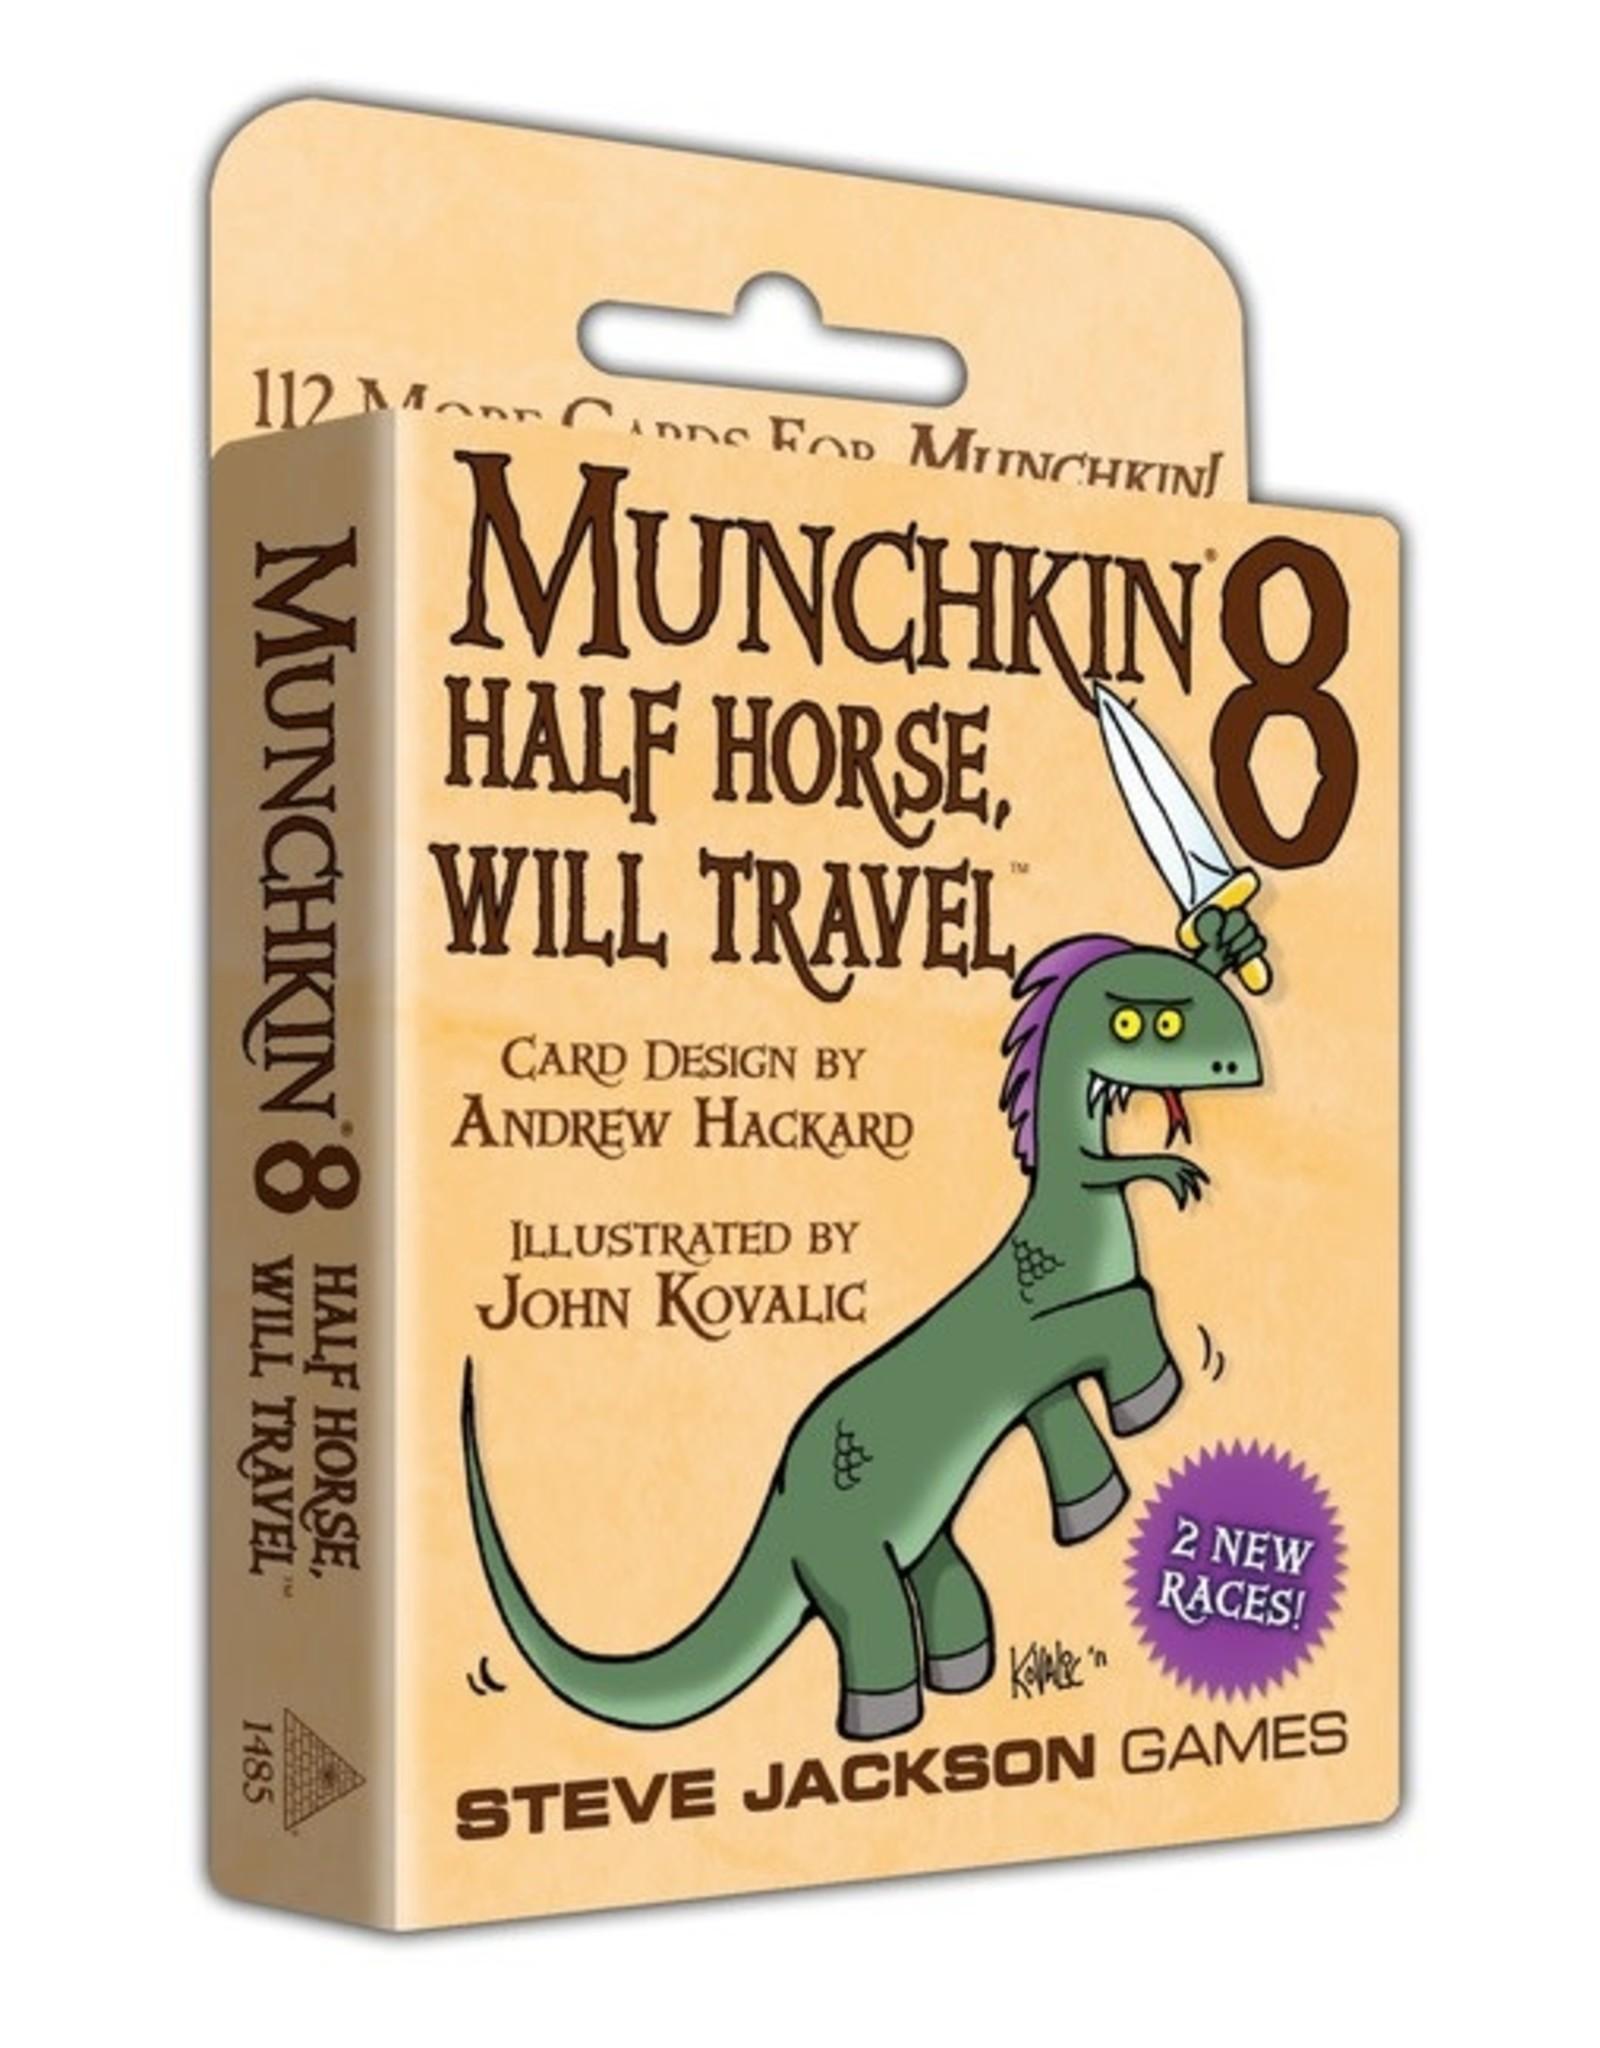 Steve Jackson Games Munchkin Original Expansions